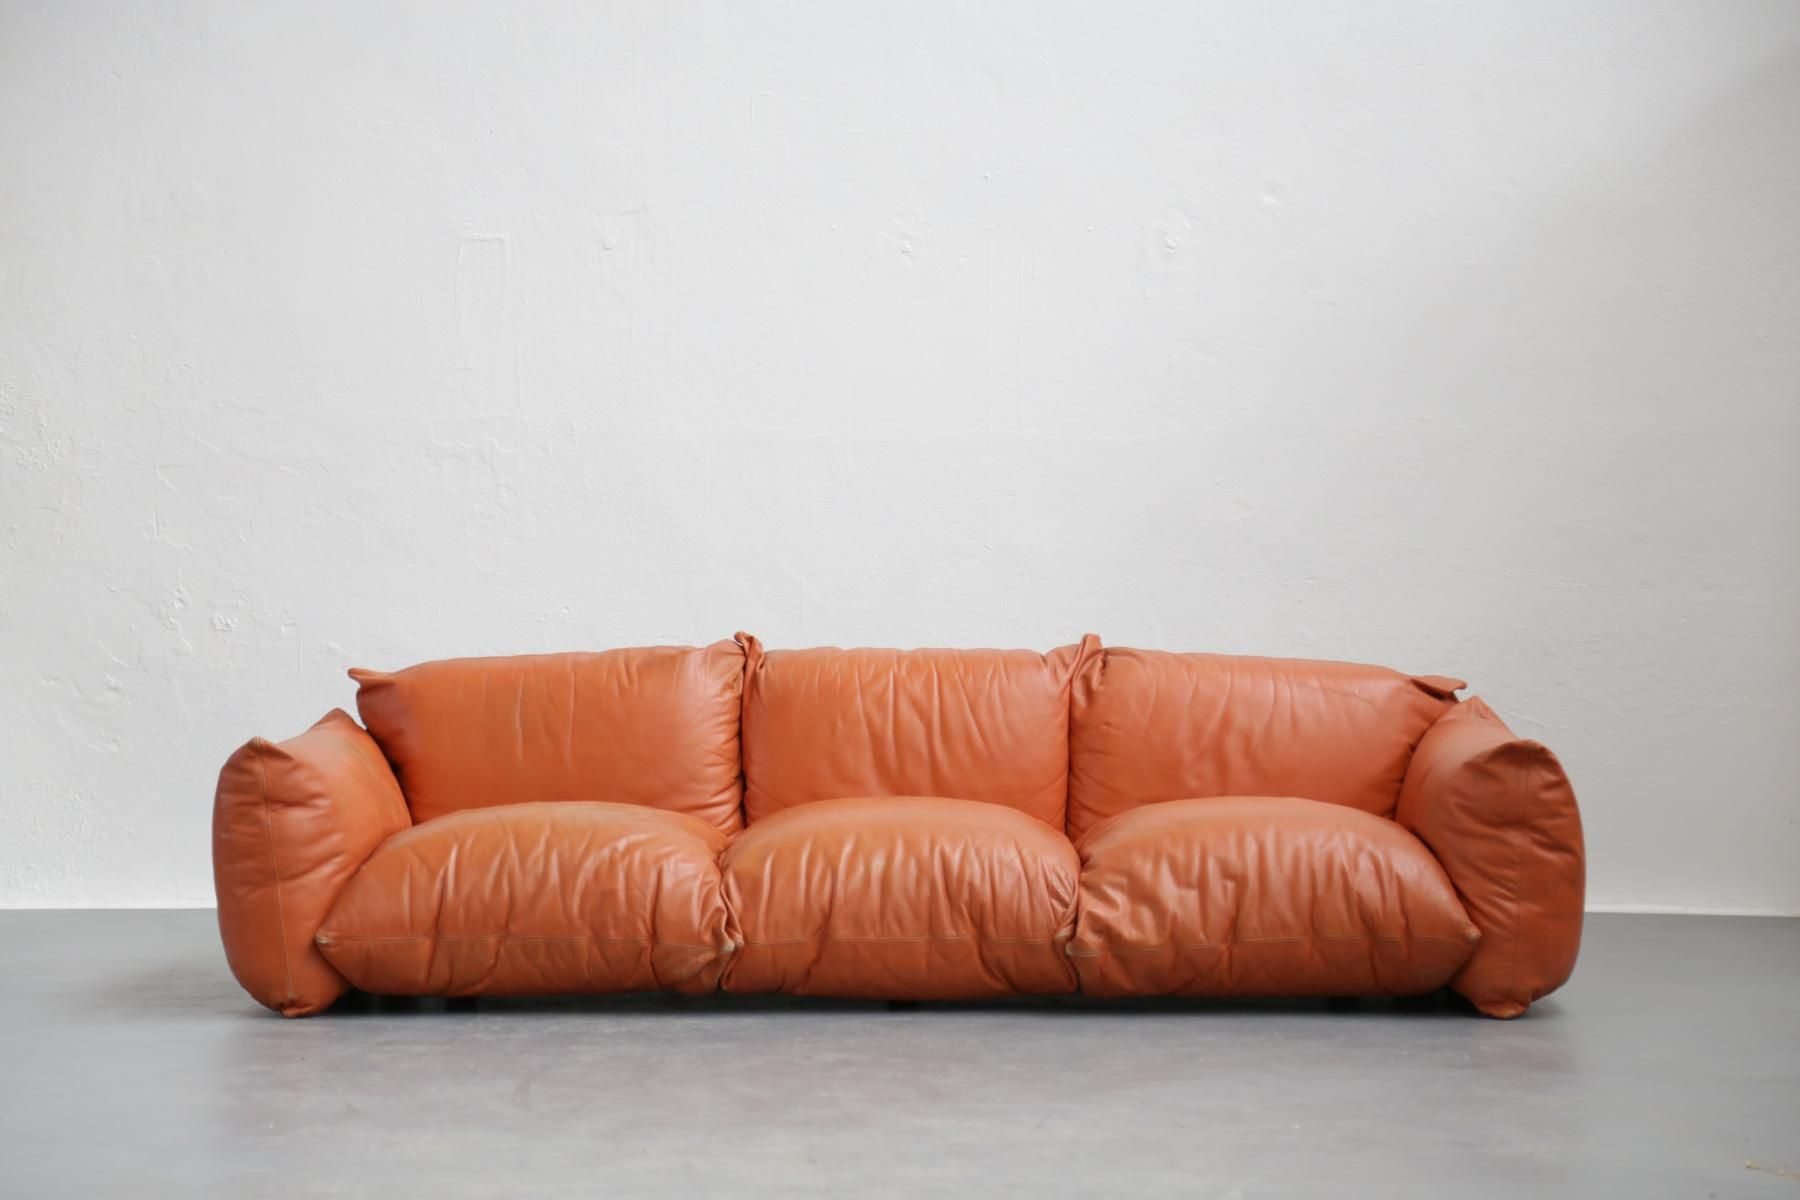 Italienisches Cognac Ledersofa 1960er Bei Pamono Kaufen Italian Leather Sofa Leather Sofa Sofa